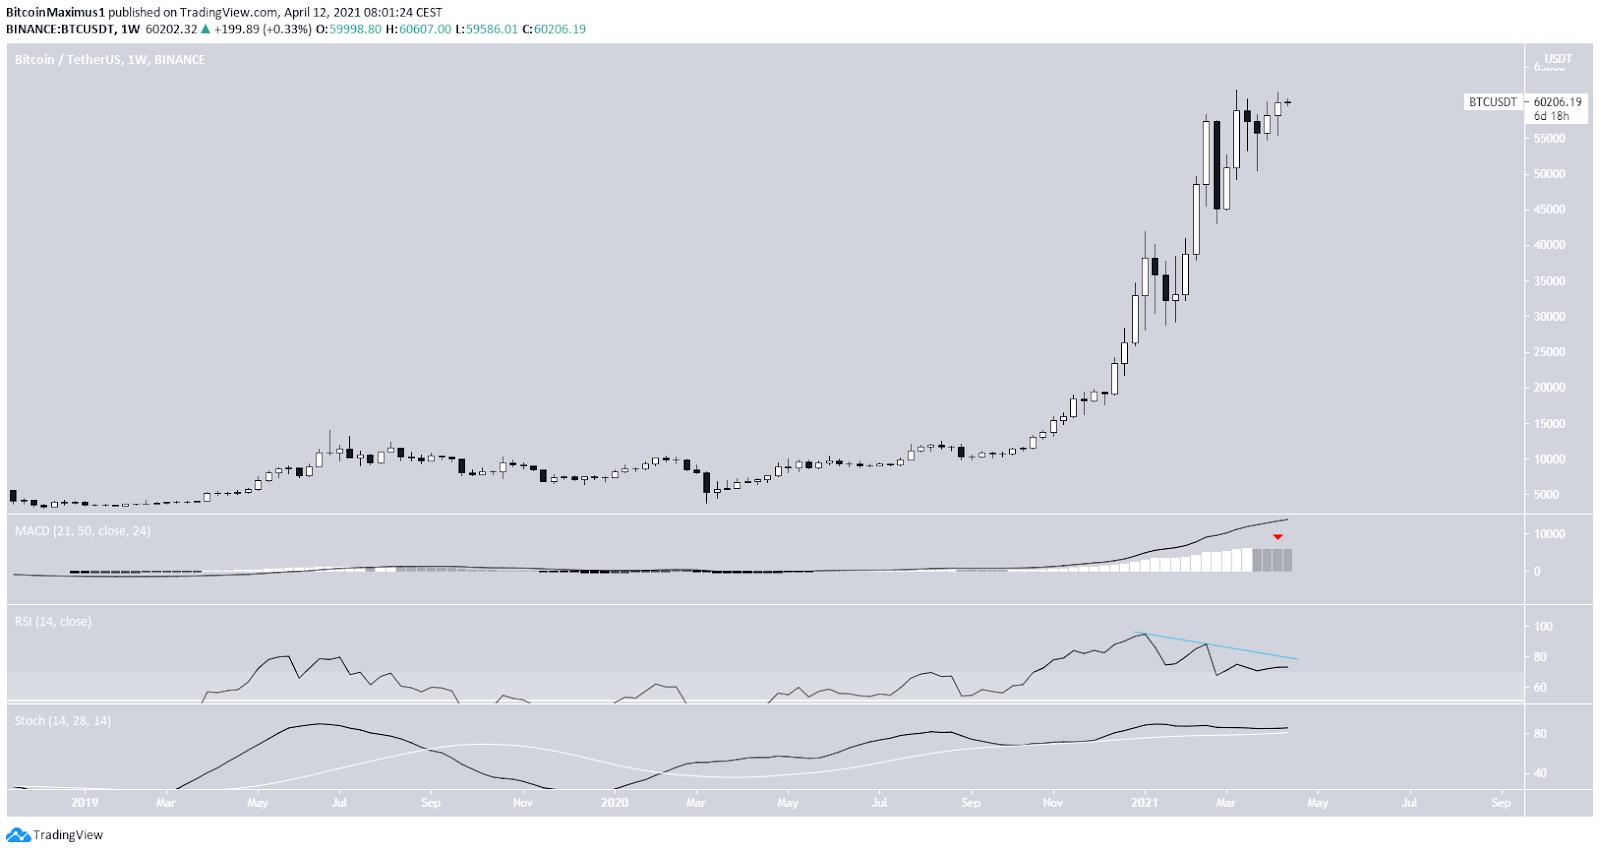 Bitcoin Preis Wochenchart 12.04.2021